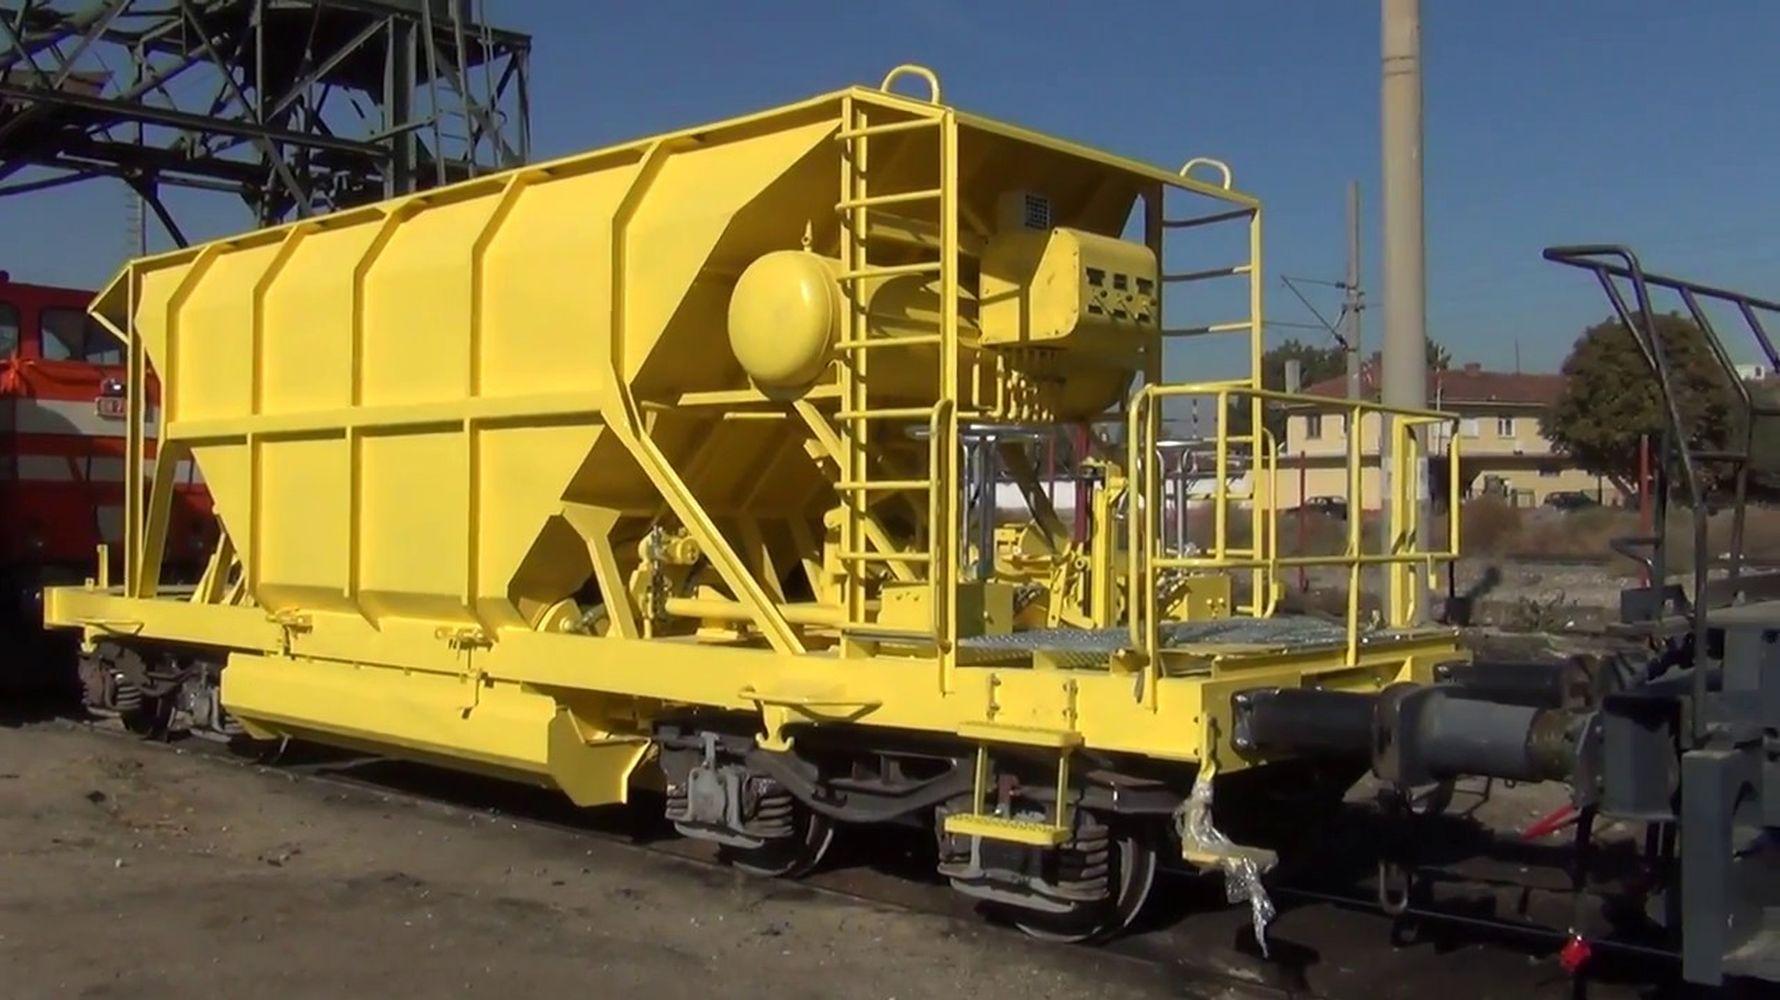 ballast wagons